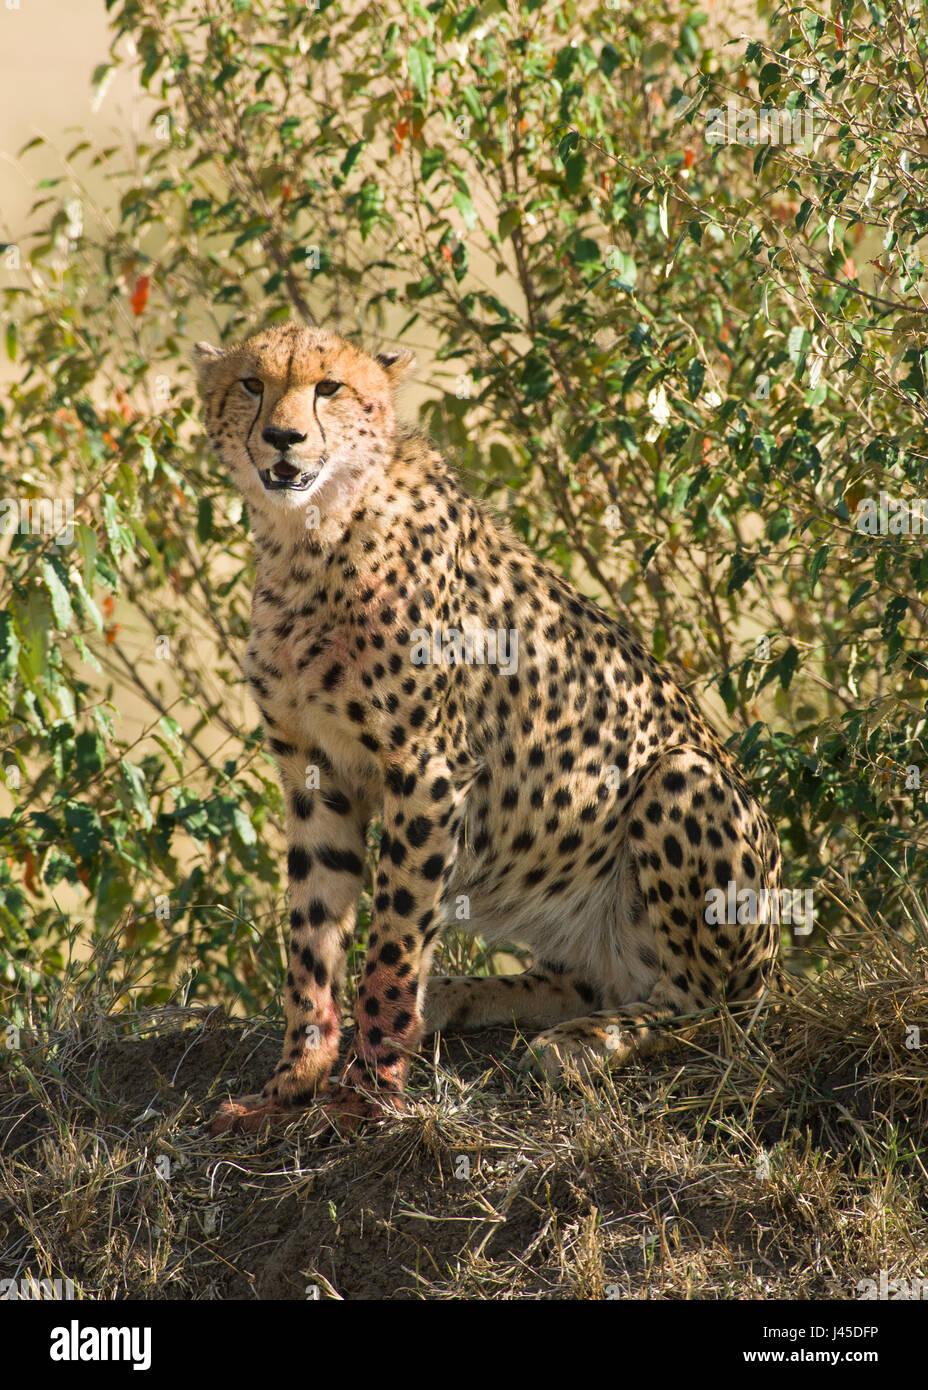 Cheetah (Acinonyx jubatus) Sitting on Mound, Maasai Mara, Kenya Stock Photo